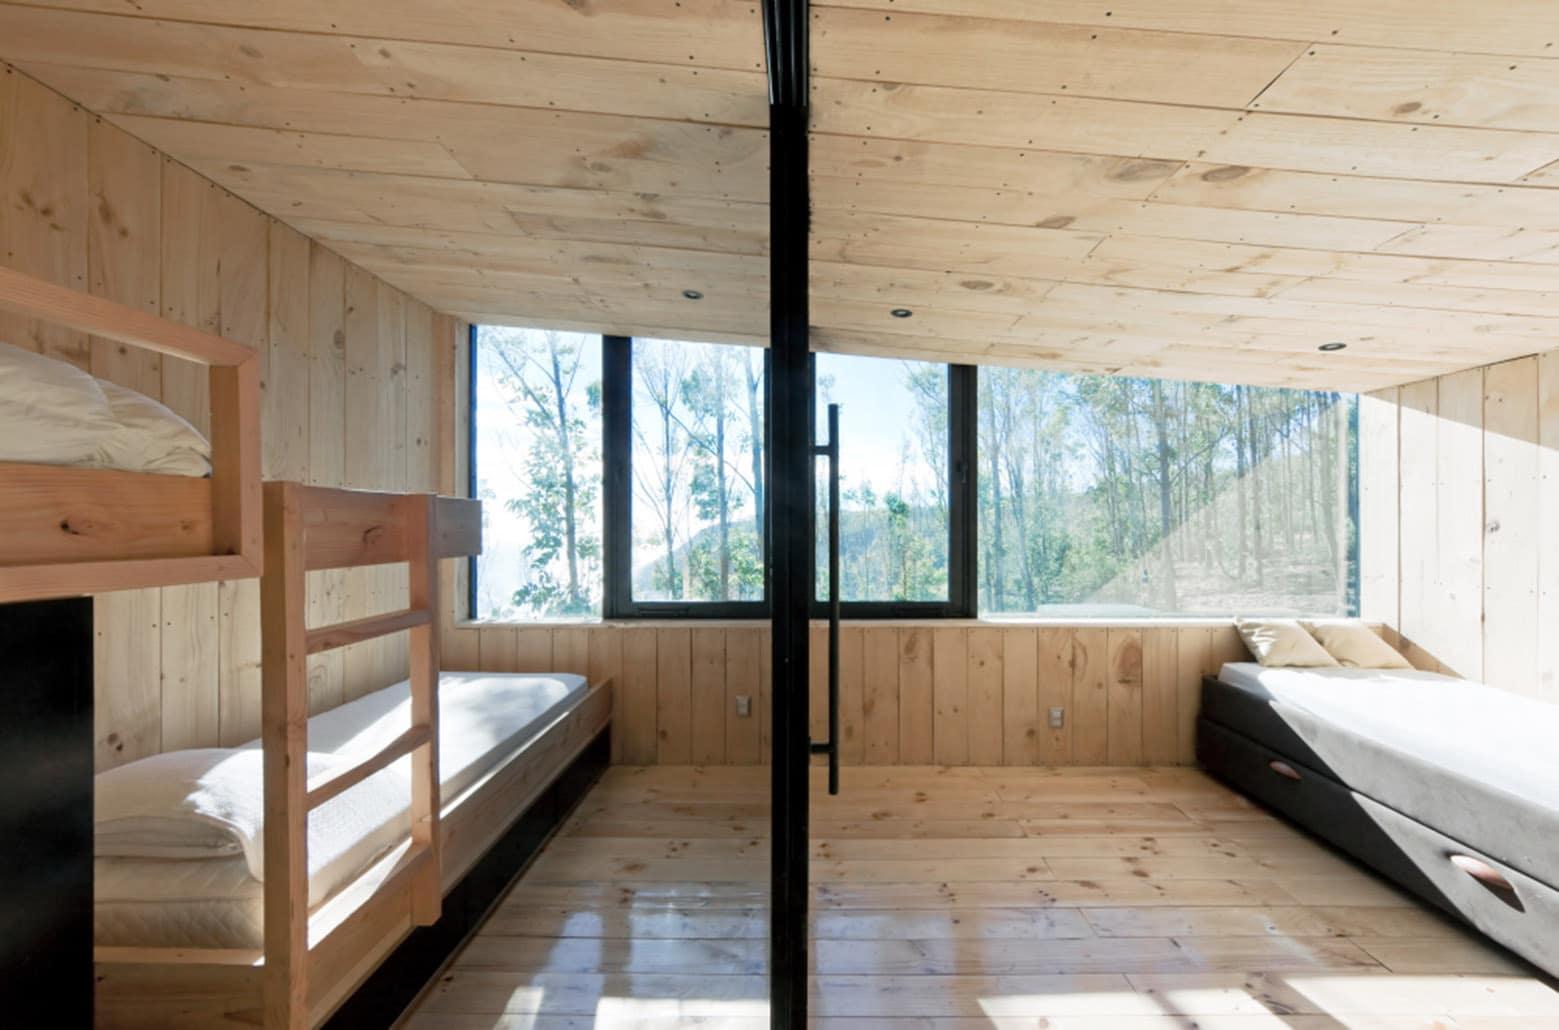 Dise o de casa moderna de dos pisos con planos construye for Techos y paredes verdes